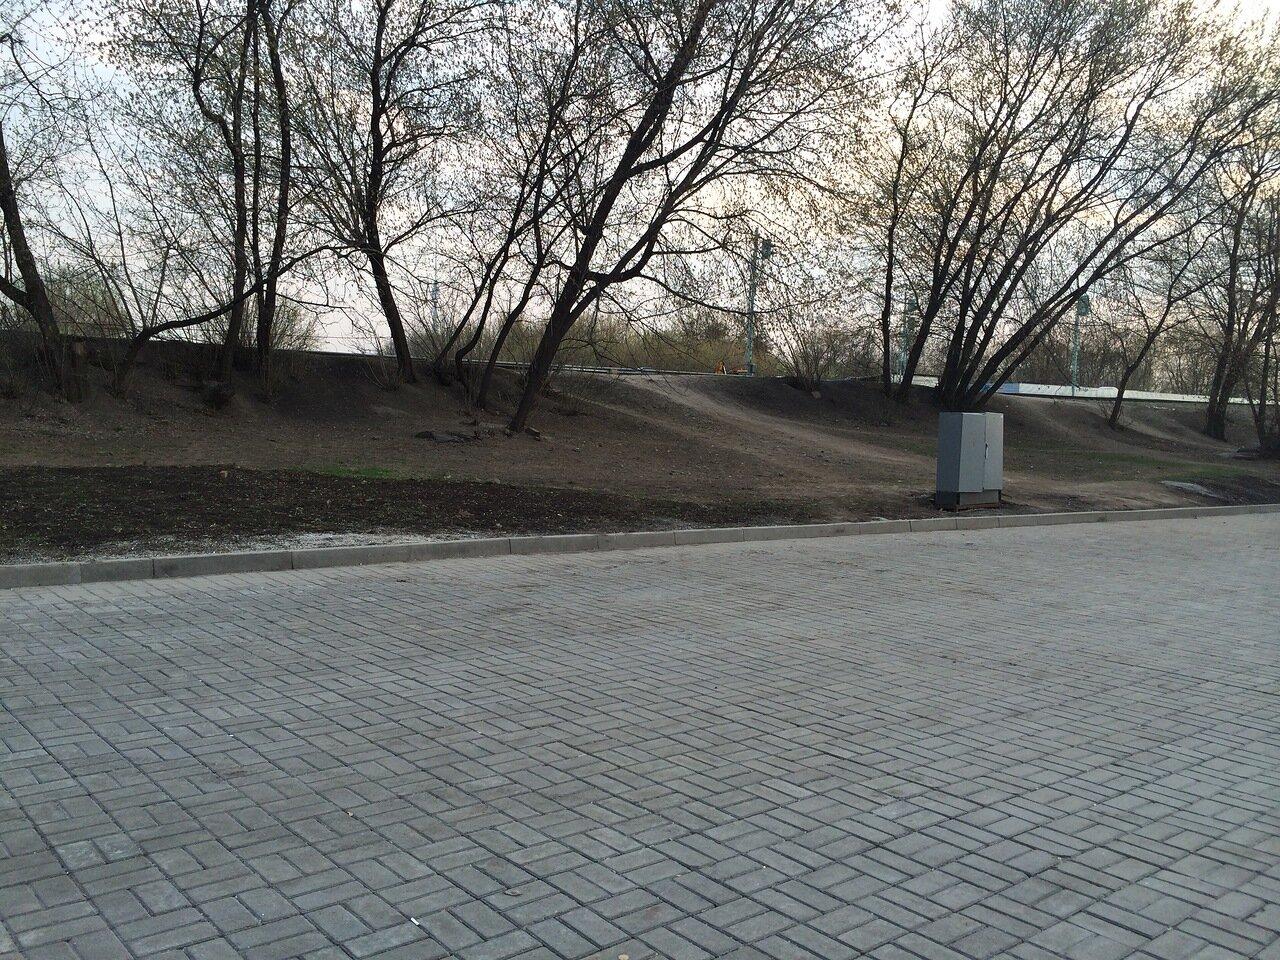 http://img-fotki.yandex.ru/get/9318/82260854.2f9/0_bd0c9_3504219c_XXXL.jpg